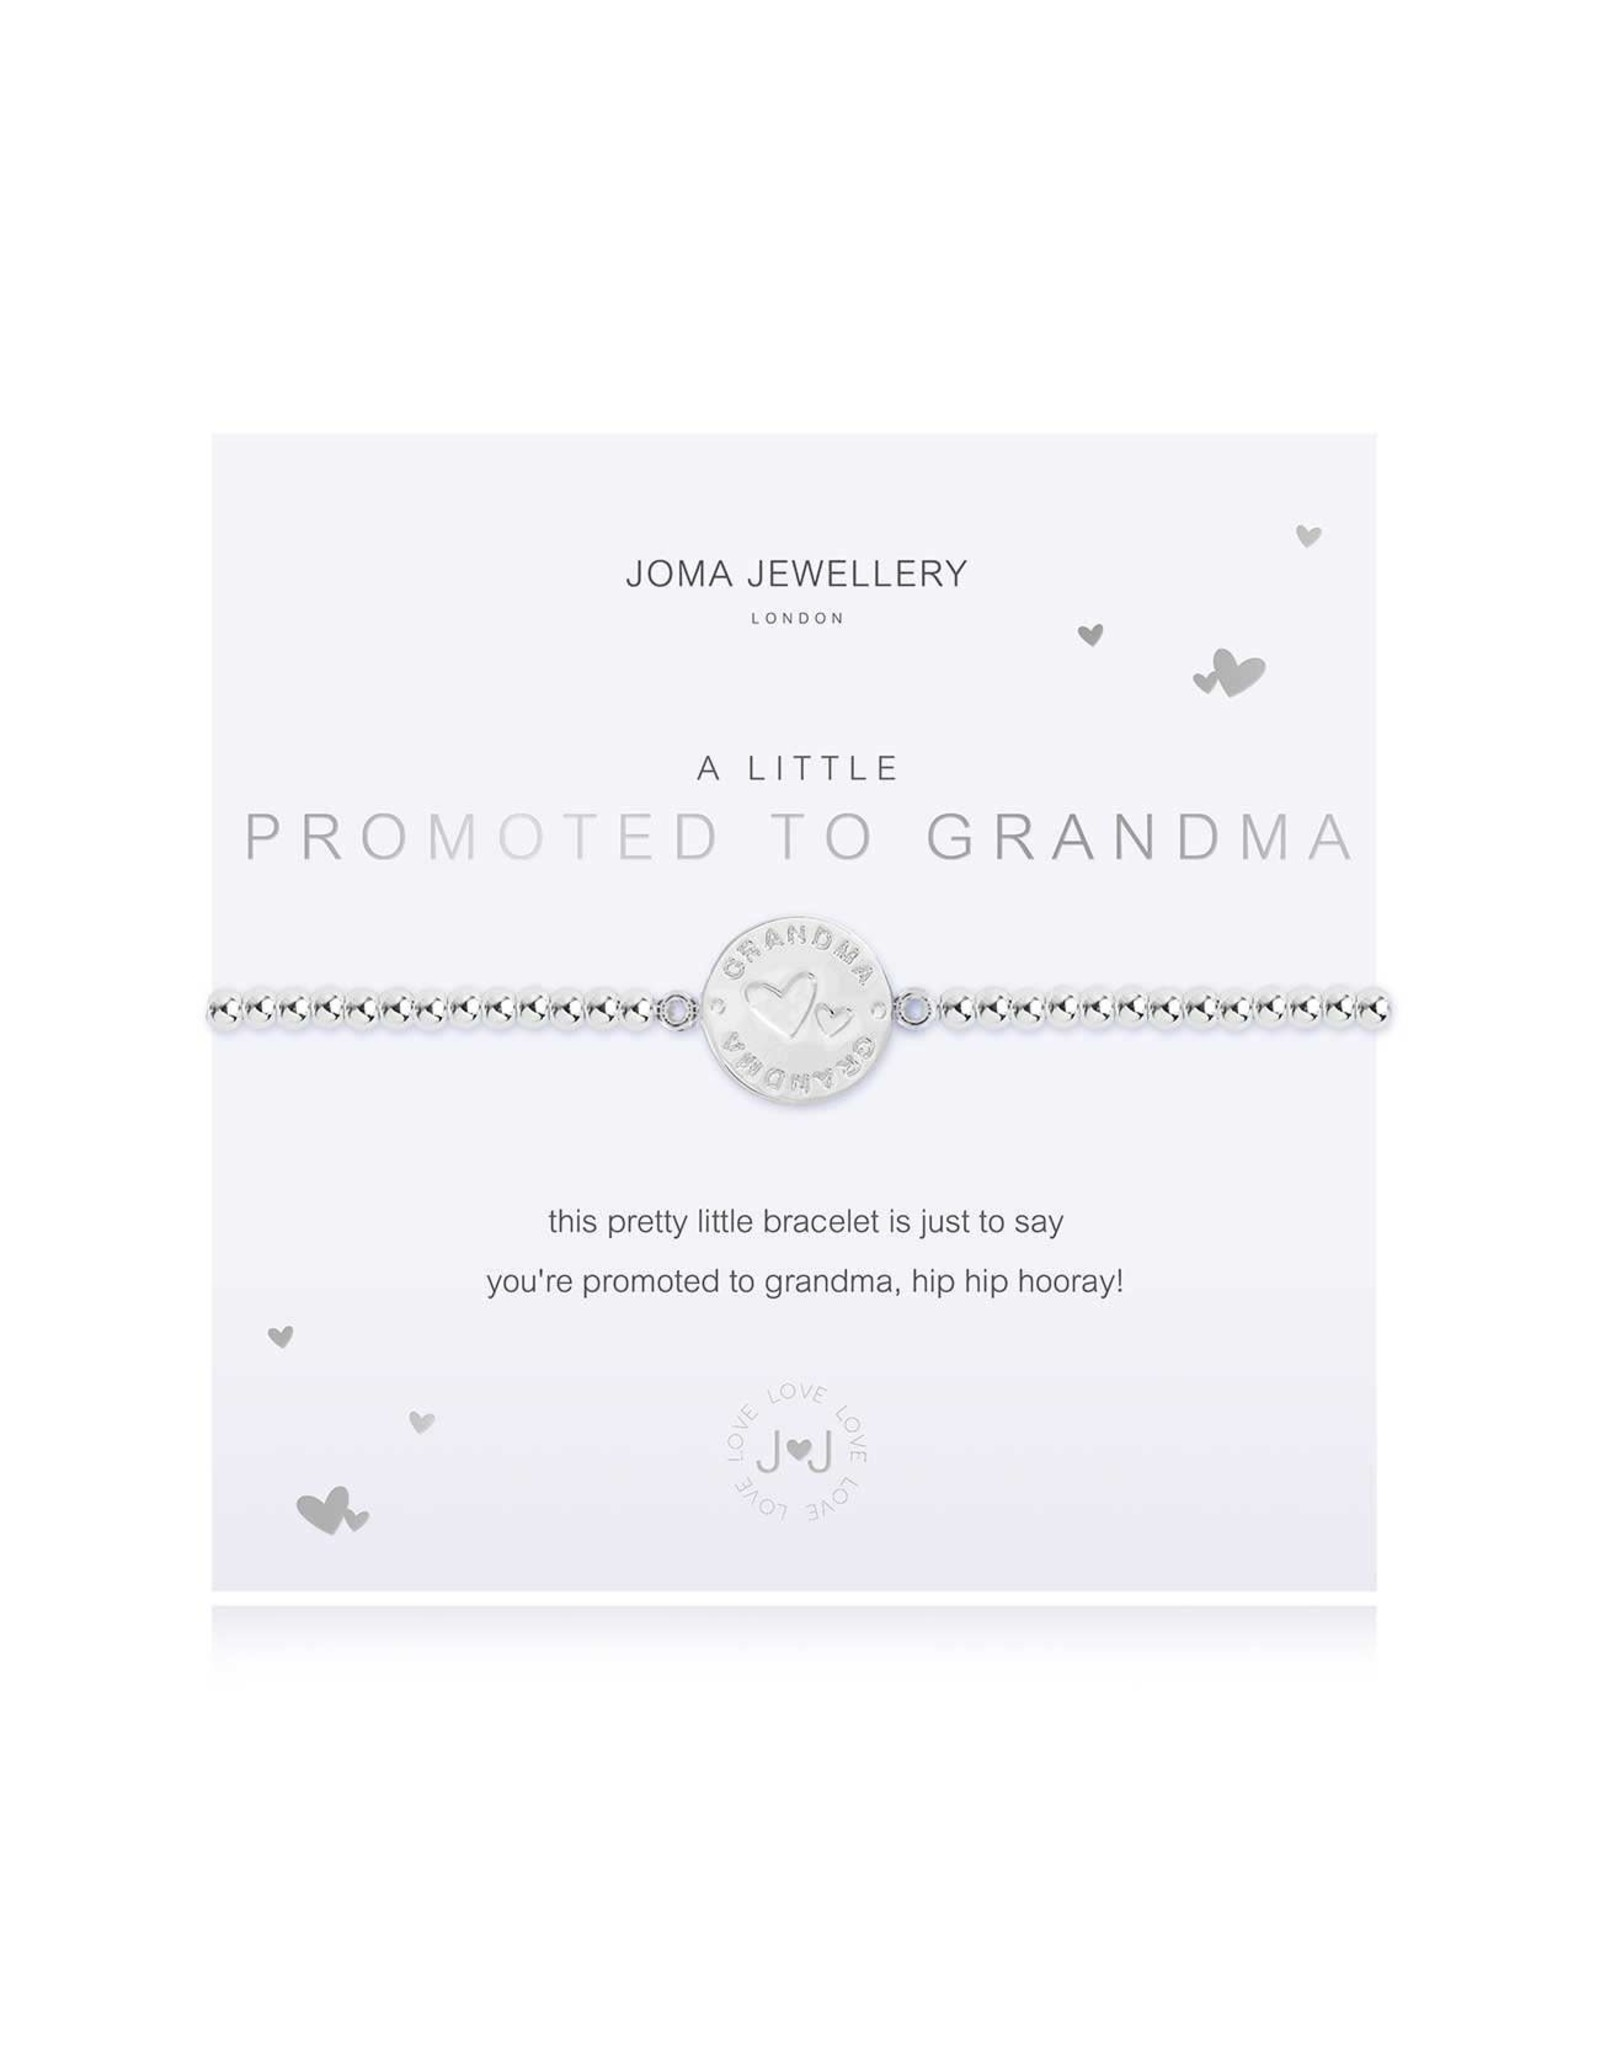 Joma Jewellery A Little - Promoted to Grandma